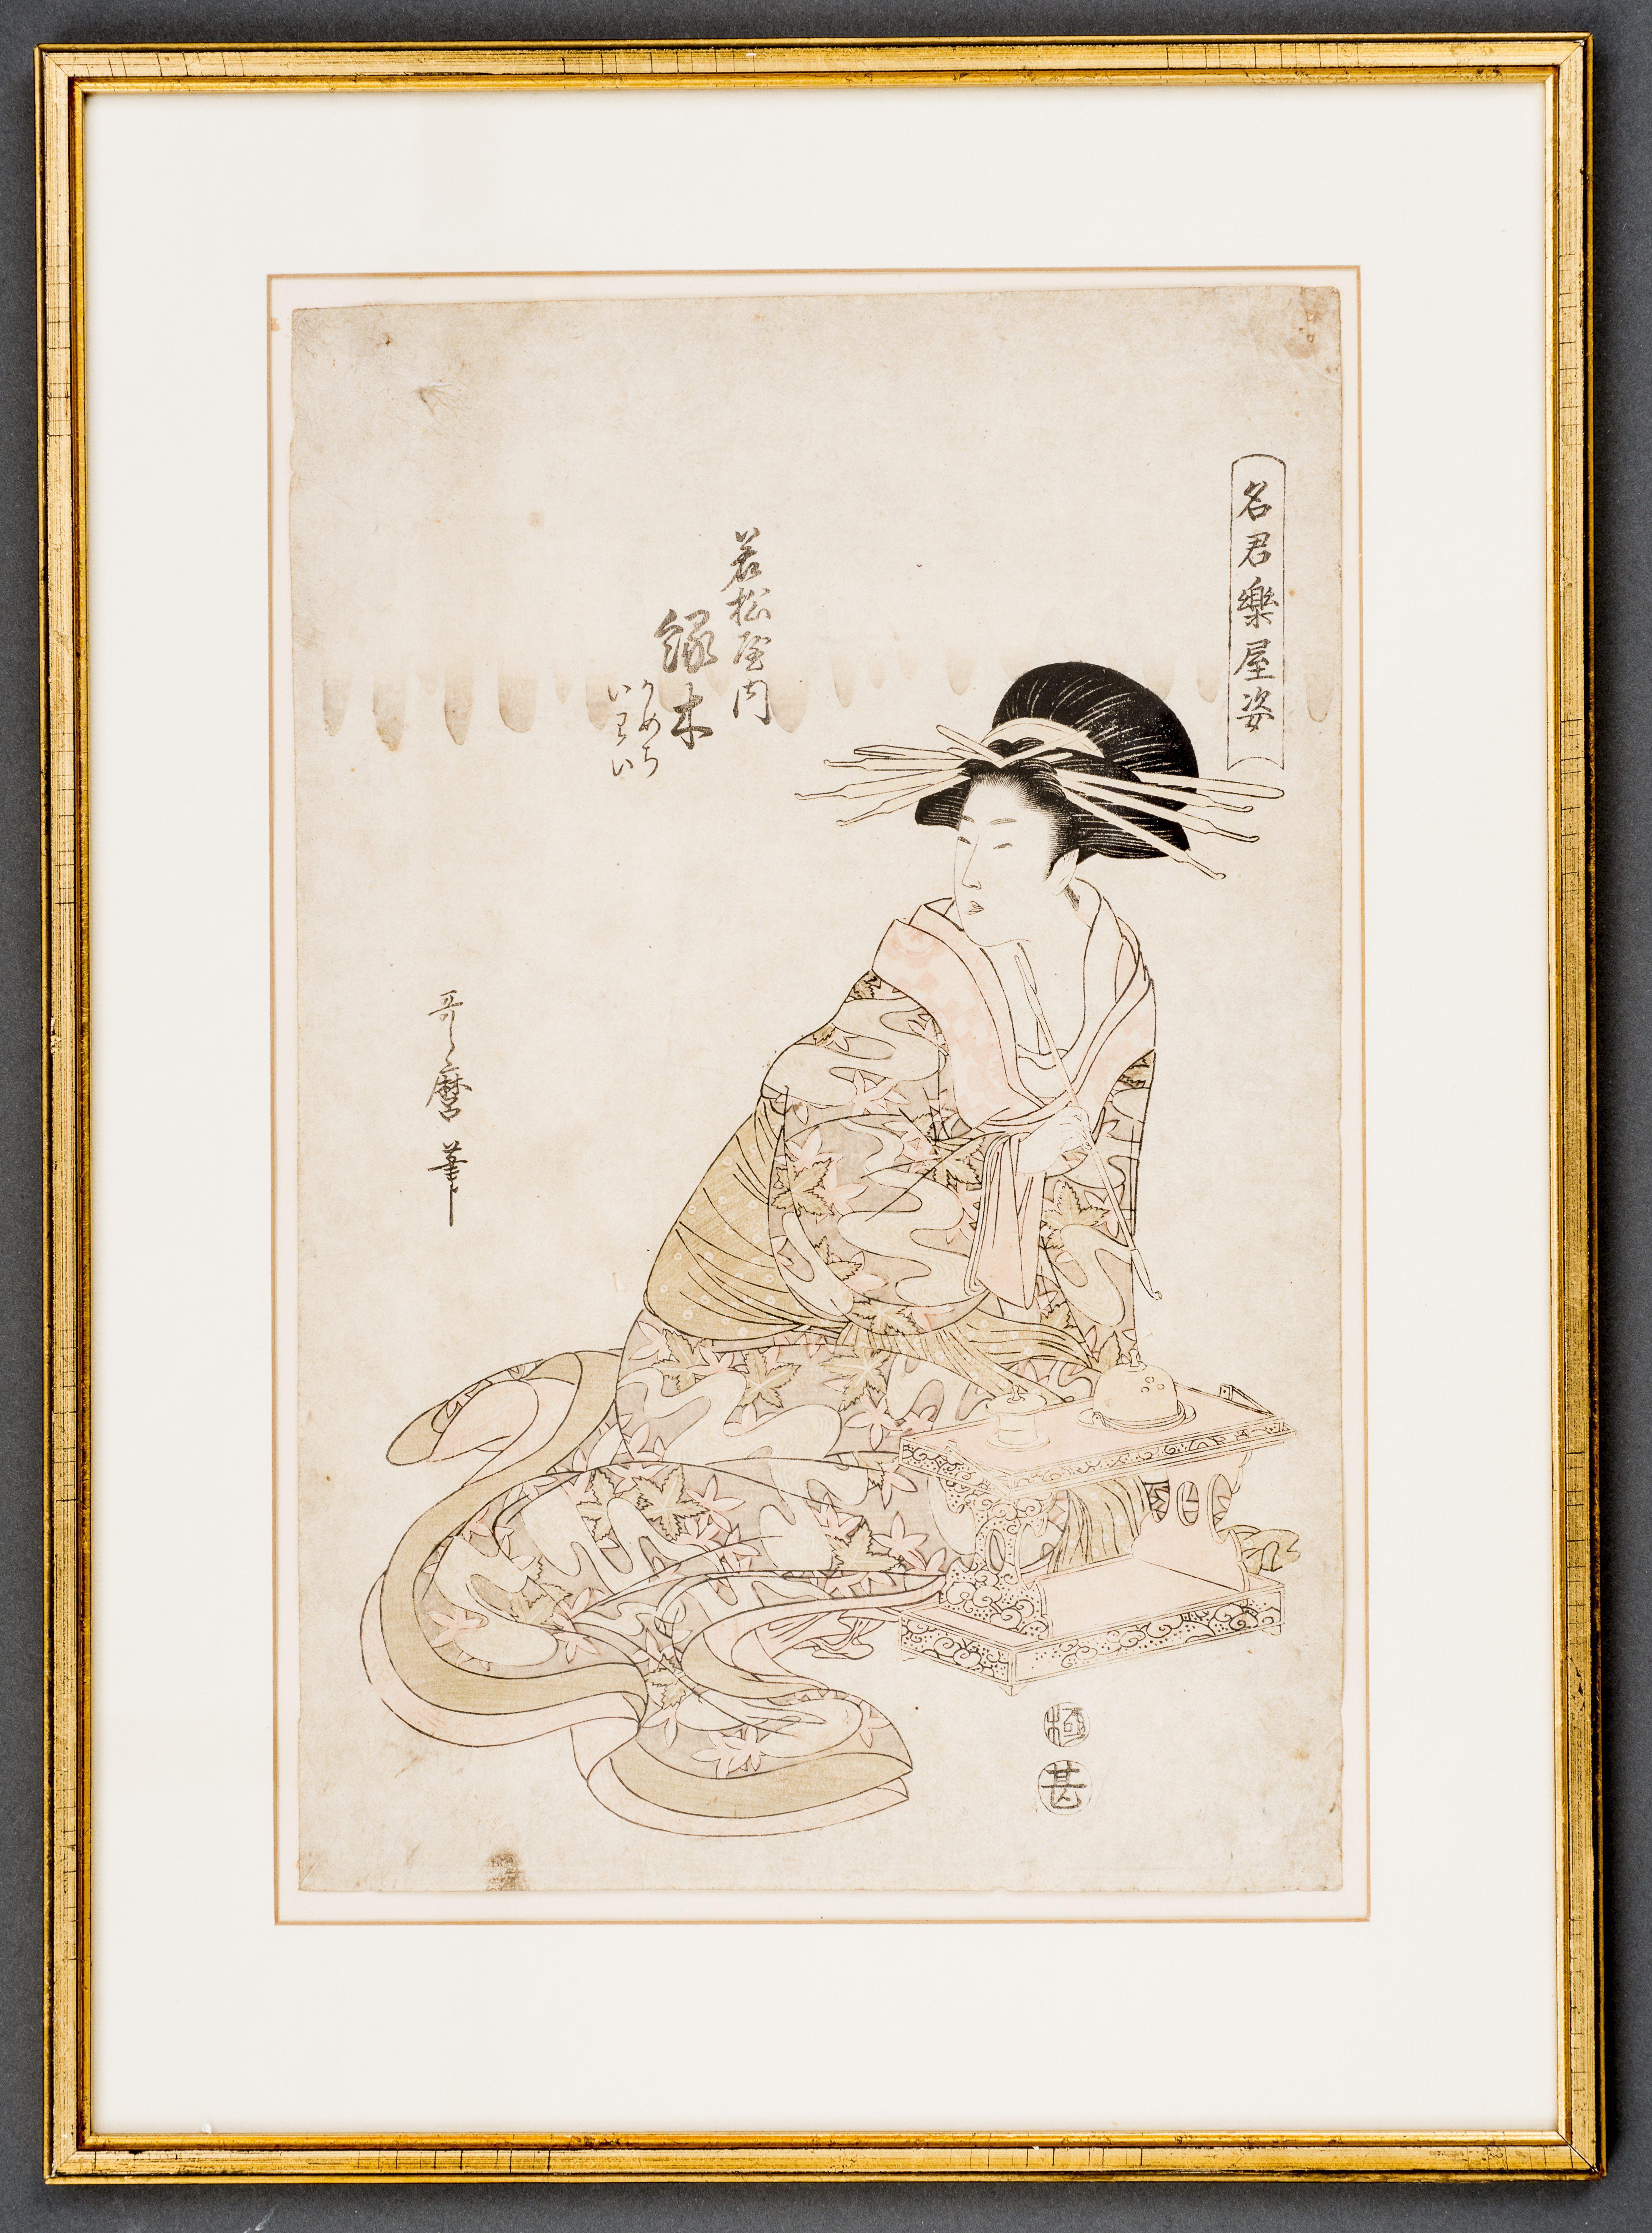 KITAGAWA UTAMARO II - 喜多川歌麿二代 (tätig ca. 1800 - 1830) | Gallery Zacke